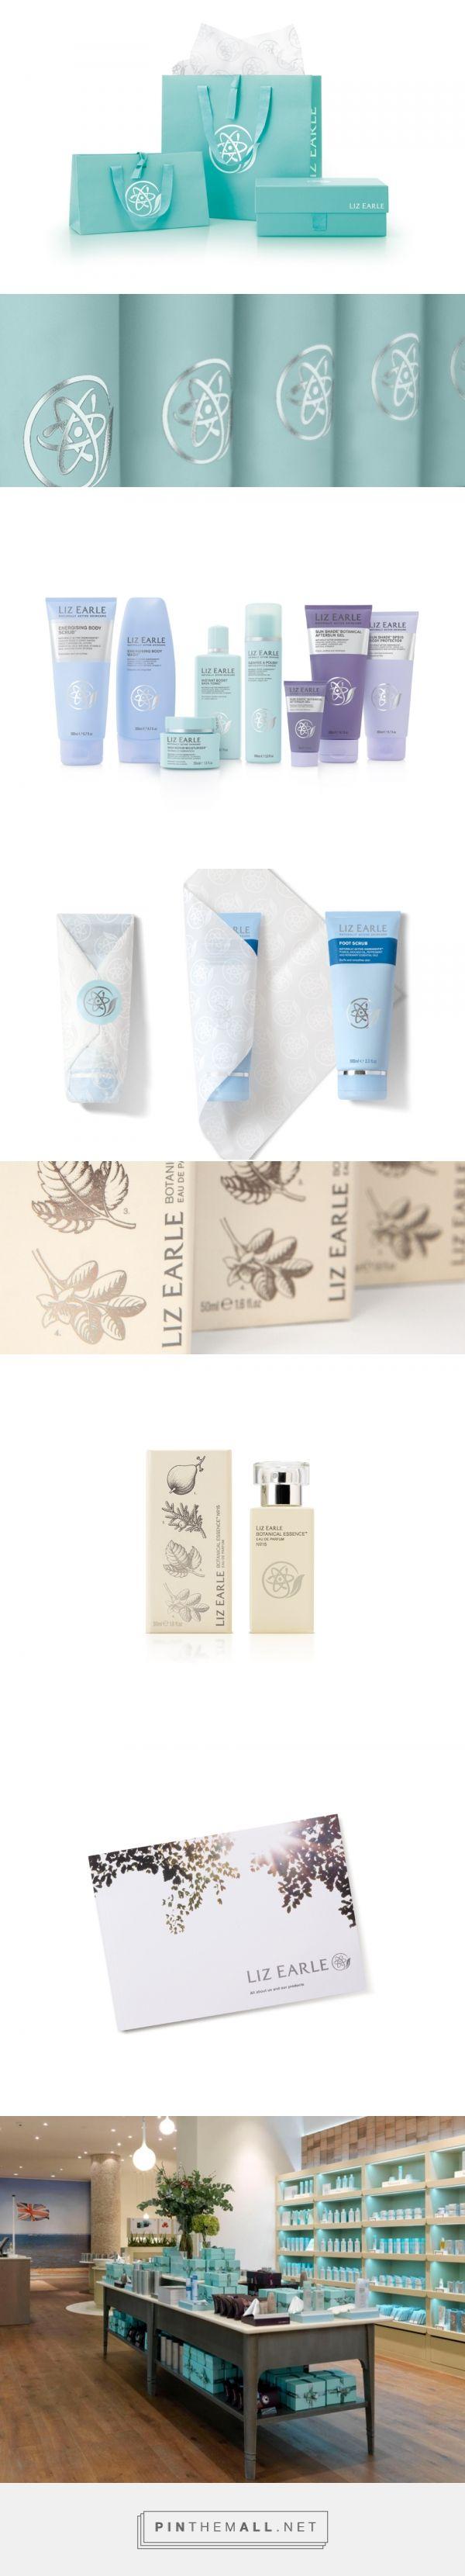 Turner Duckworth — Liz Earle - Designing a Brand's Material Culture | Fivestar Branding – Design and Branding Agency & Inspiration Gallery